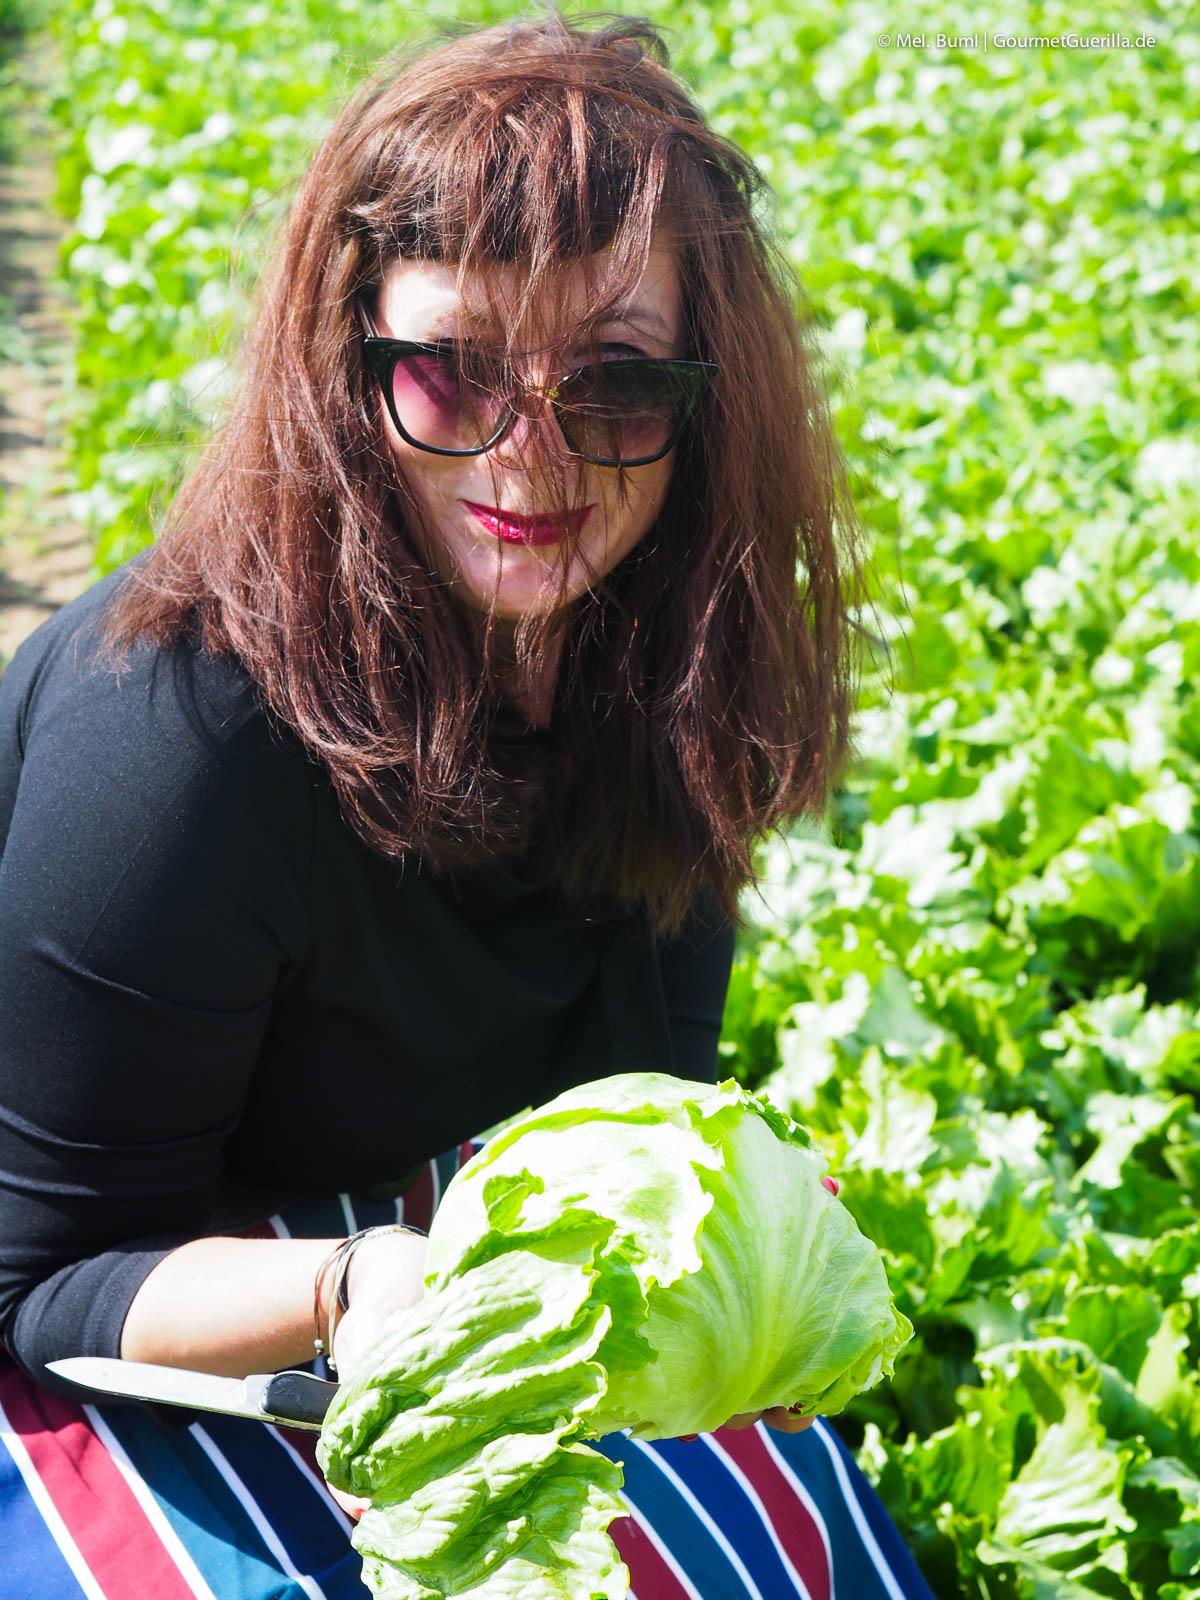 Bonduelle Academy Salat Anbau und Verarbeitung |GourmetGuerilla.de